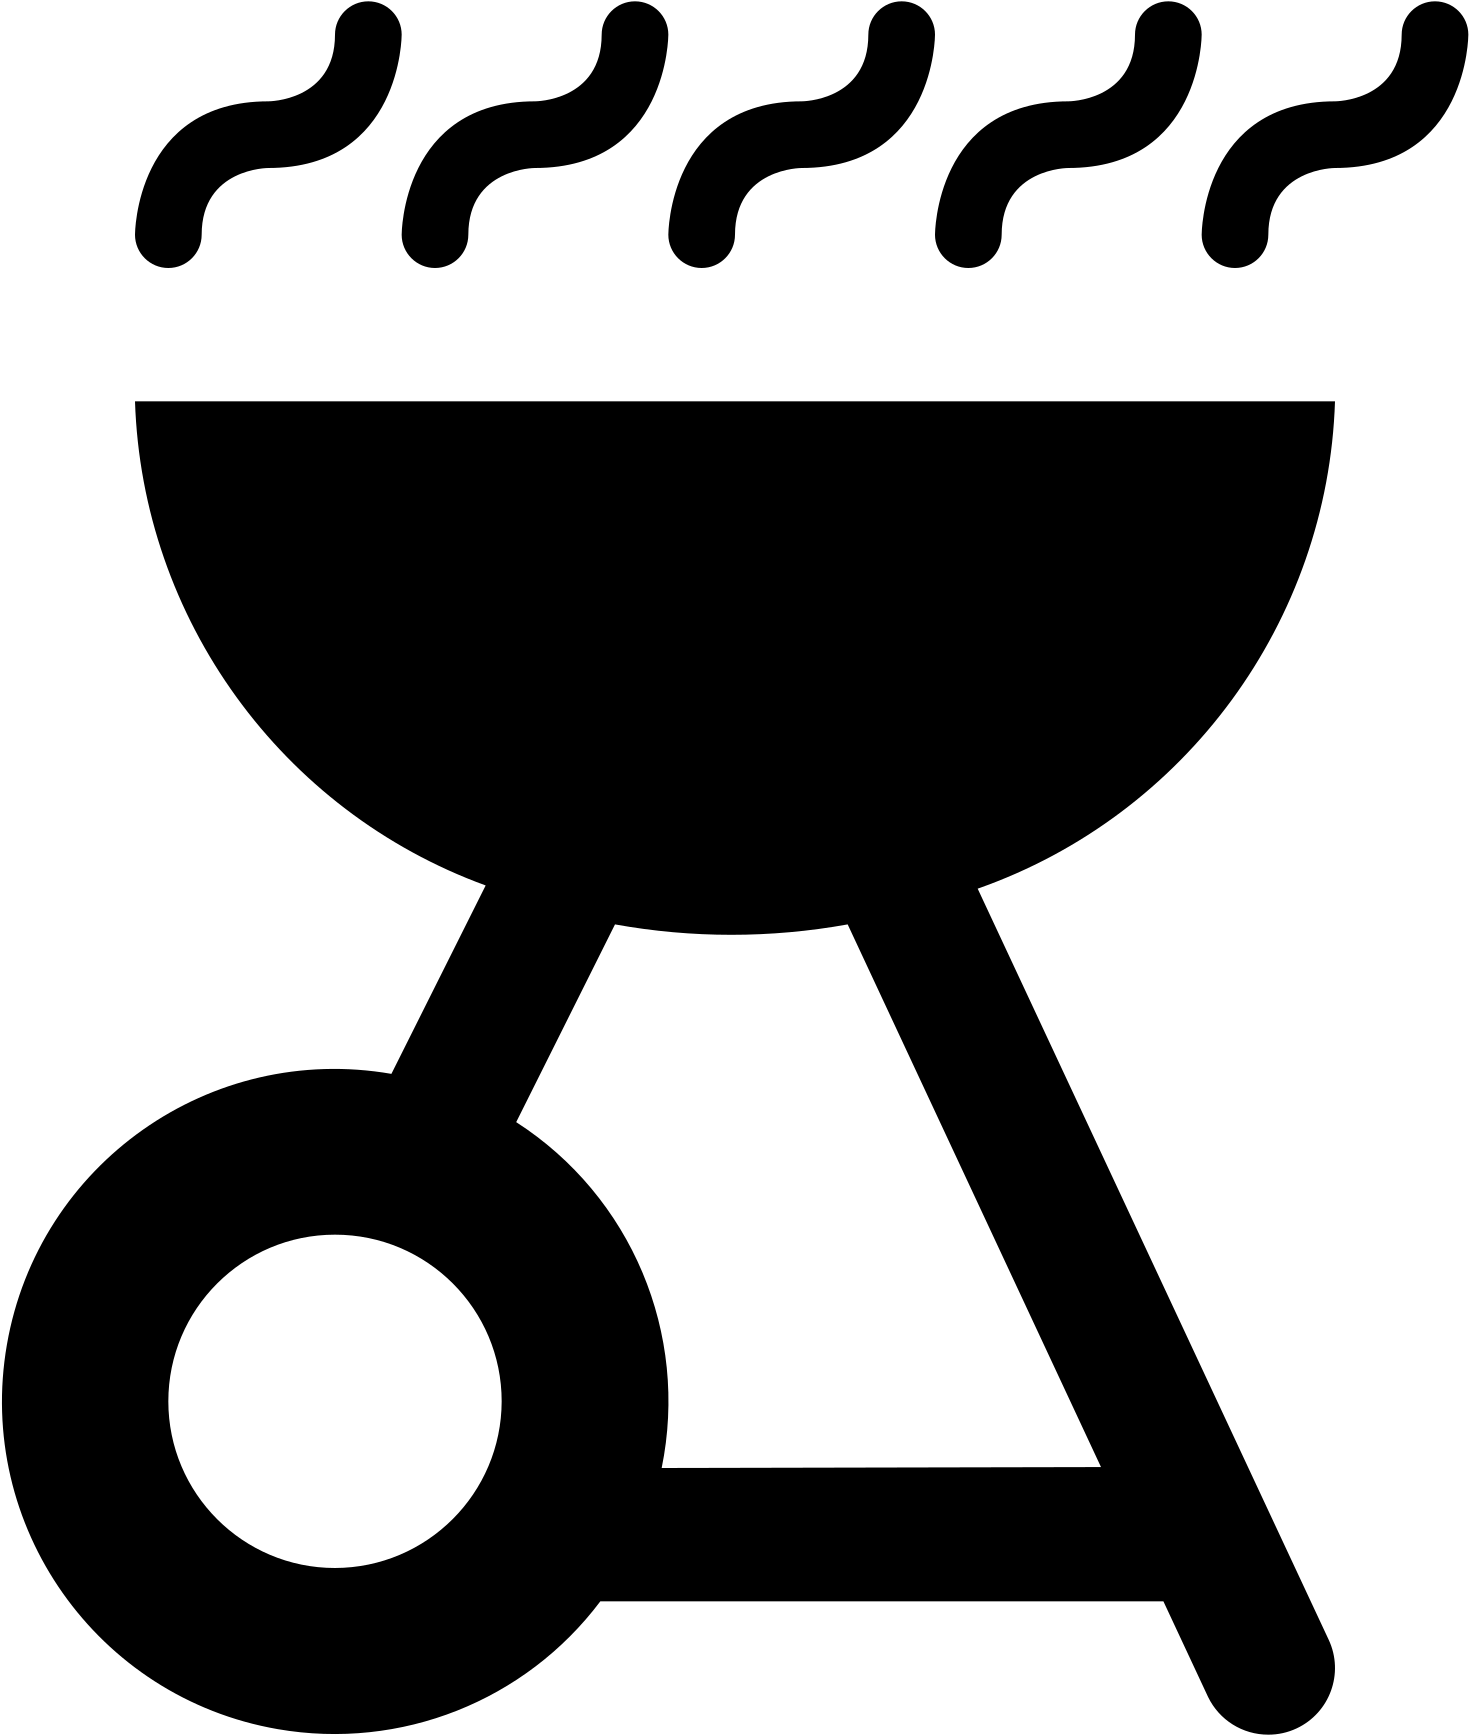 Transparent bbq clipart black and white - File Maki Bbq Wikimedia Commons Open Ⓒ - Barbecue